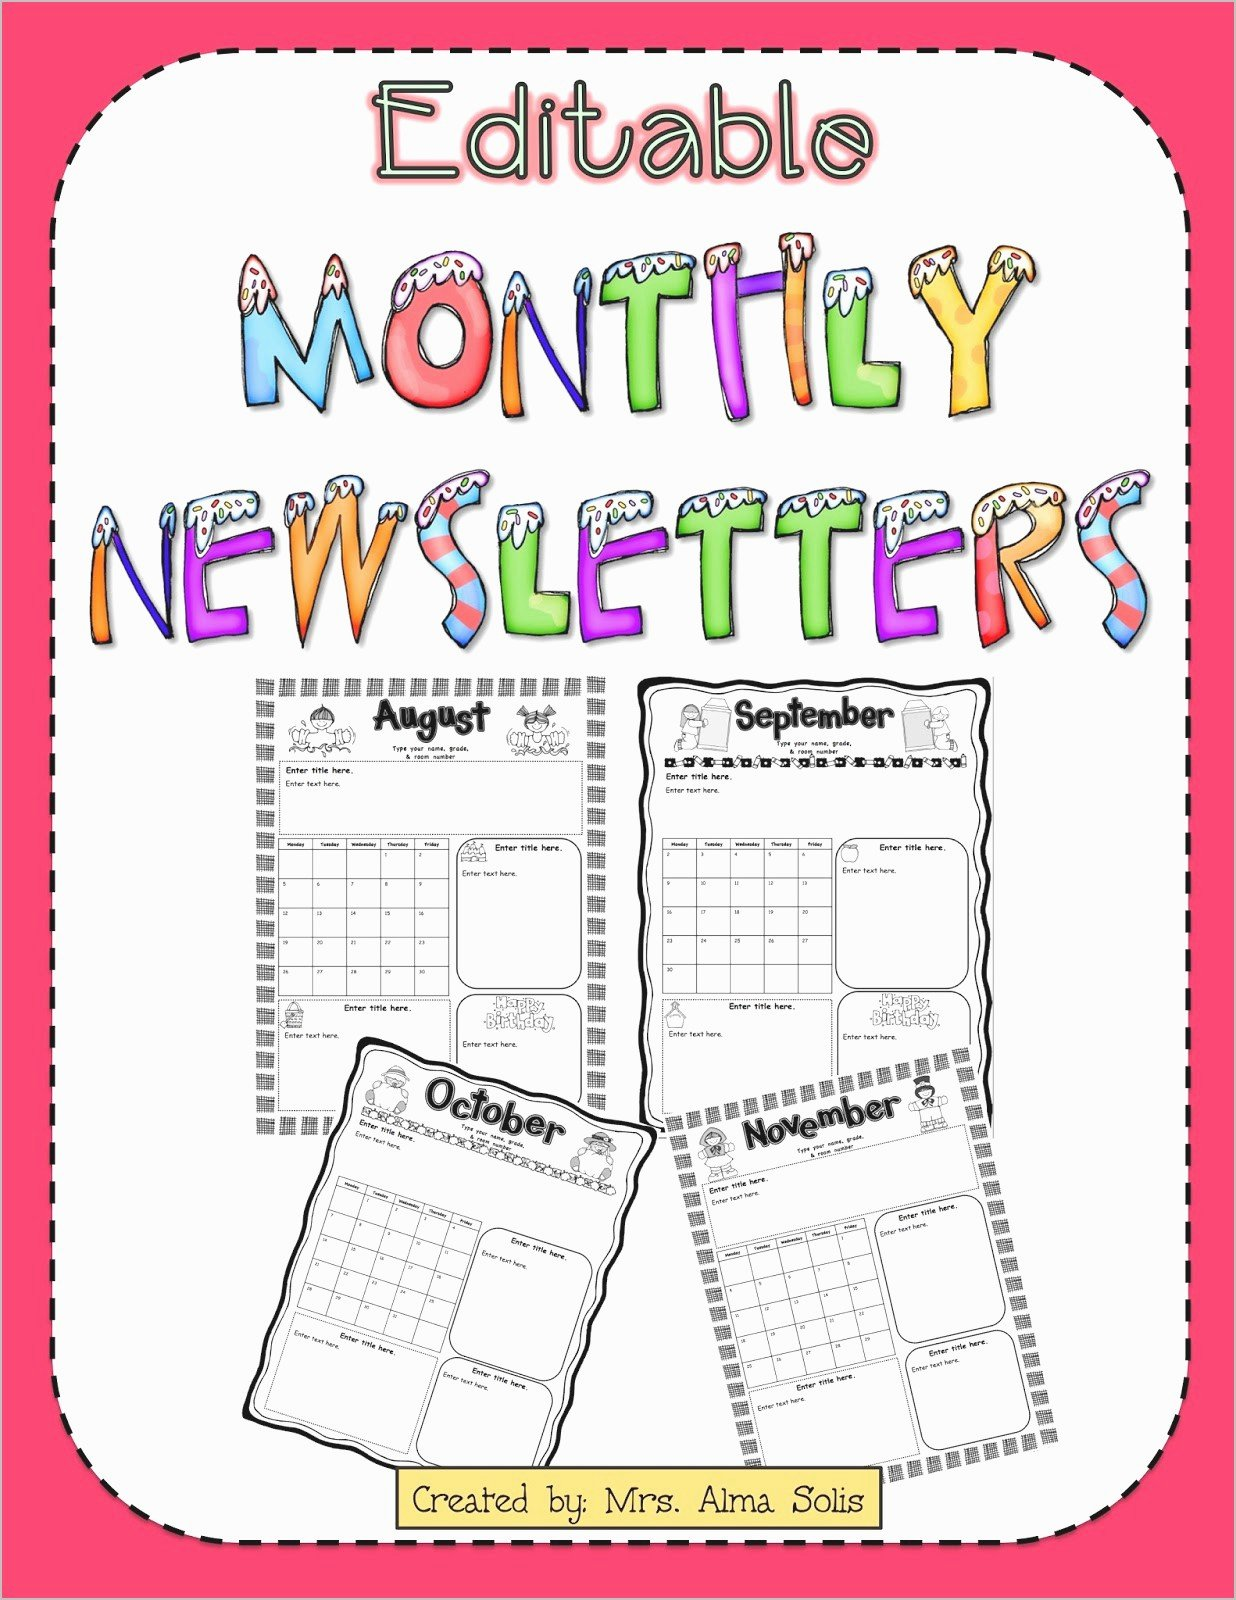 Free Preschool Newsletter Template Microsoft Word Fresh Free Editable Newsletter Templates for Word